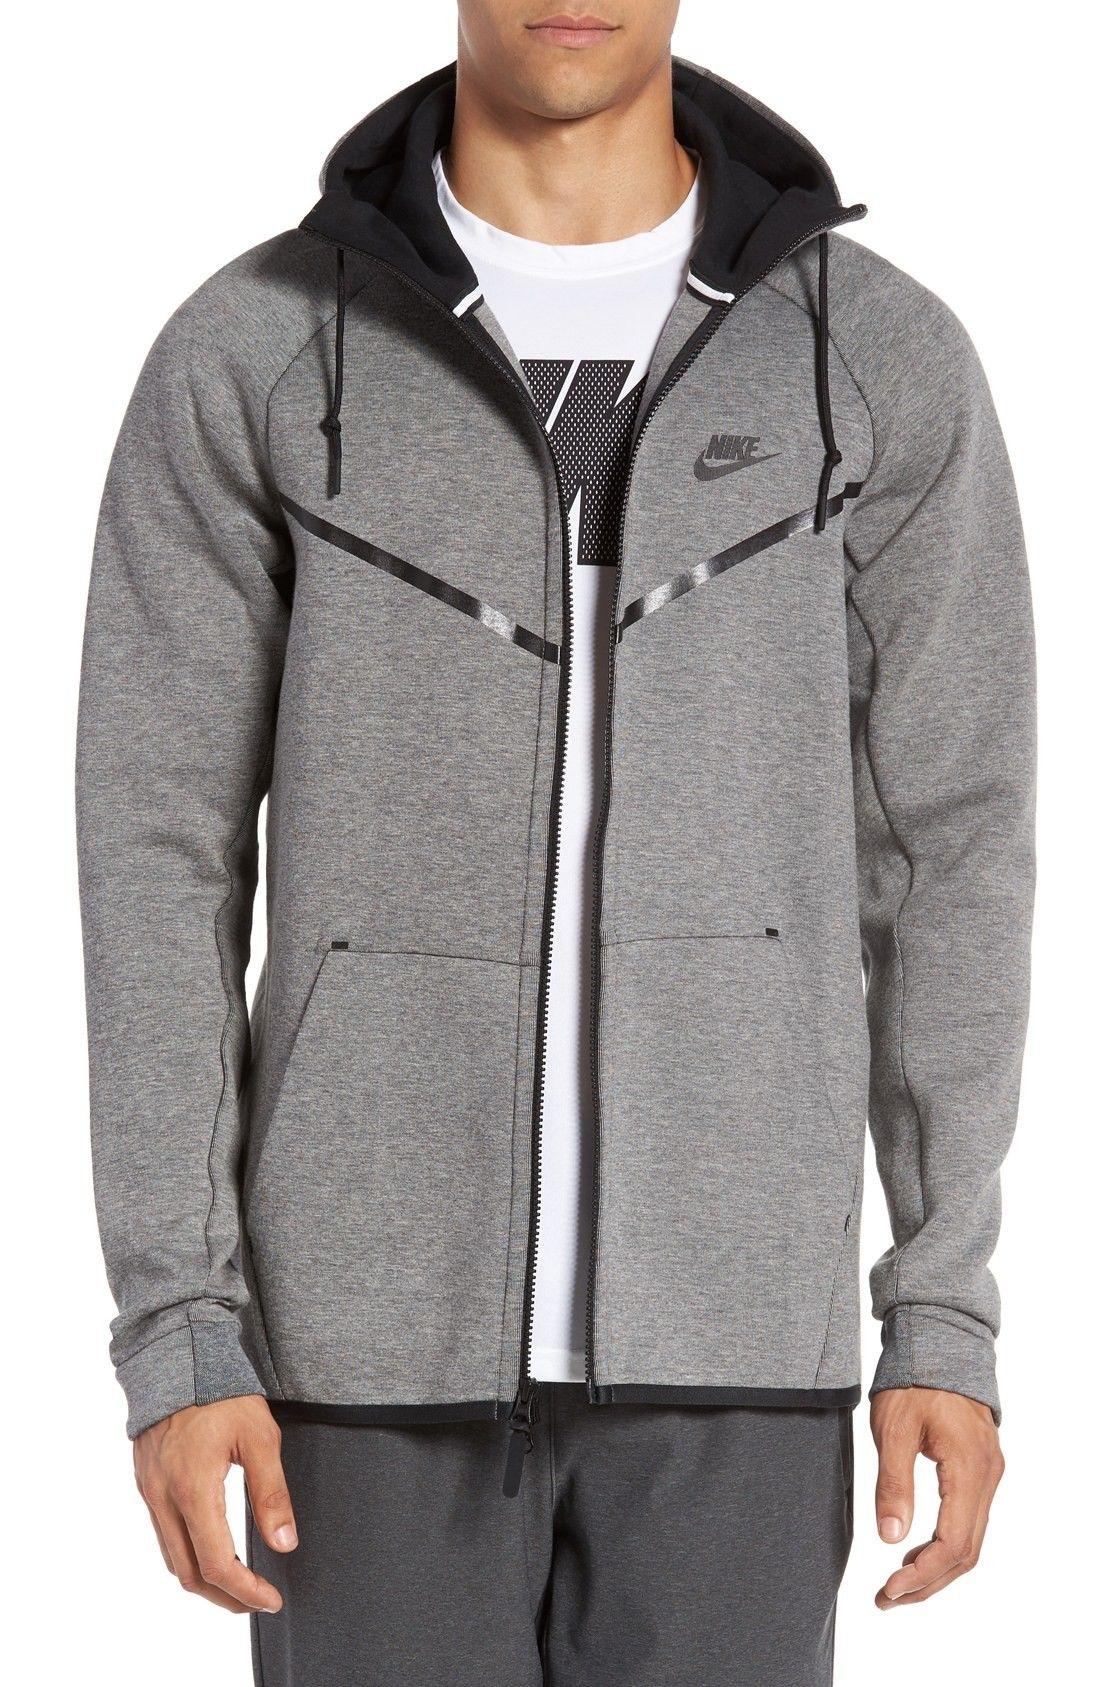 Shop Our Favorites Top Phoenix Lifestyle Blog Love And Specs Tech Fleece Hoodie Mens Sweatshirts Hoodie Fashion [ 1687 x 1100 Pixel ]